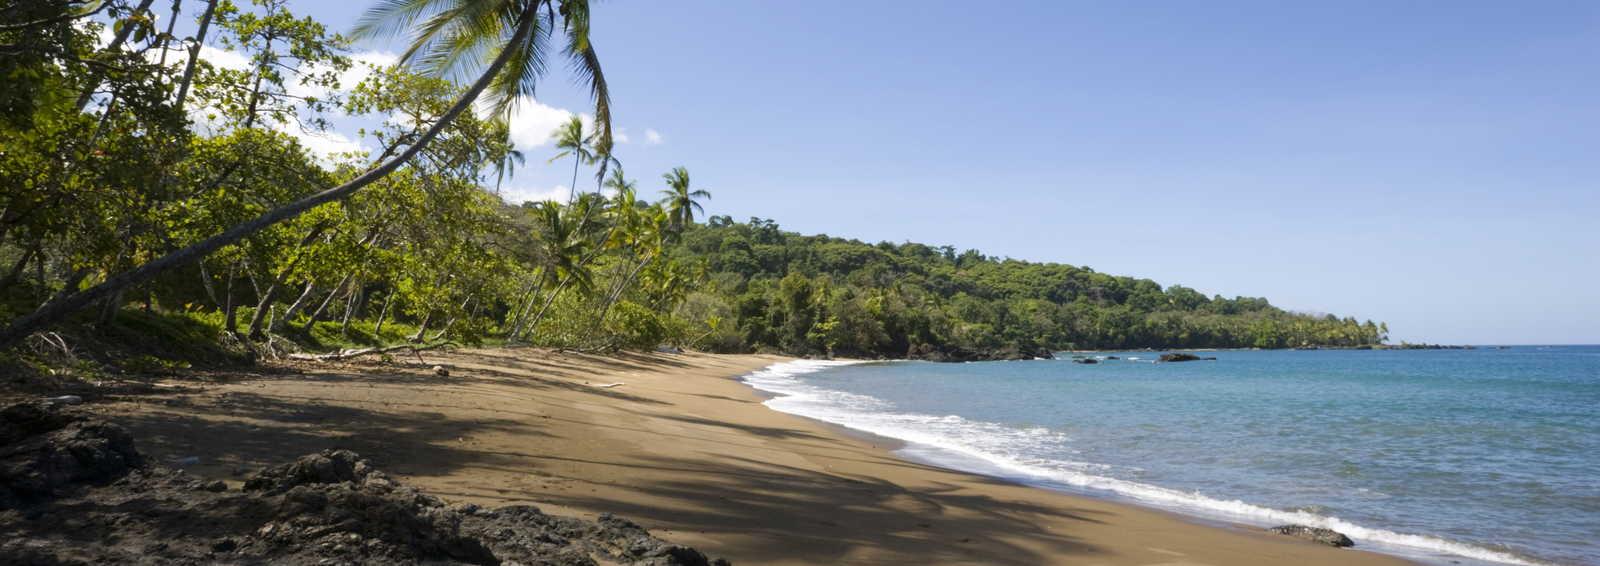 Costa Rica's beautiful coastline